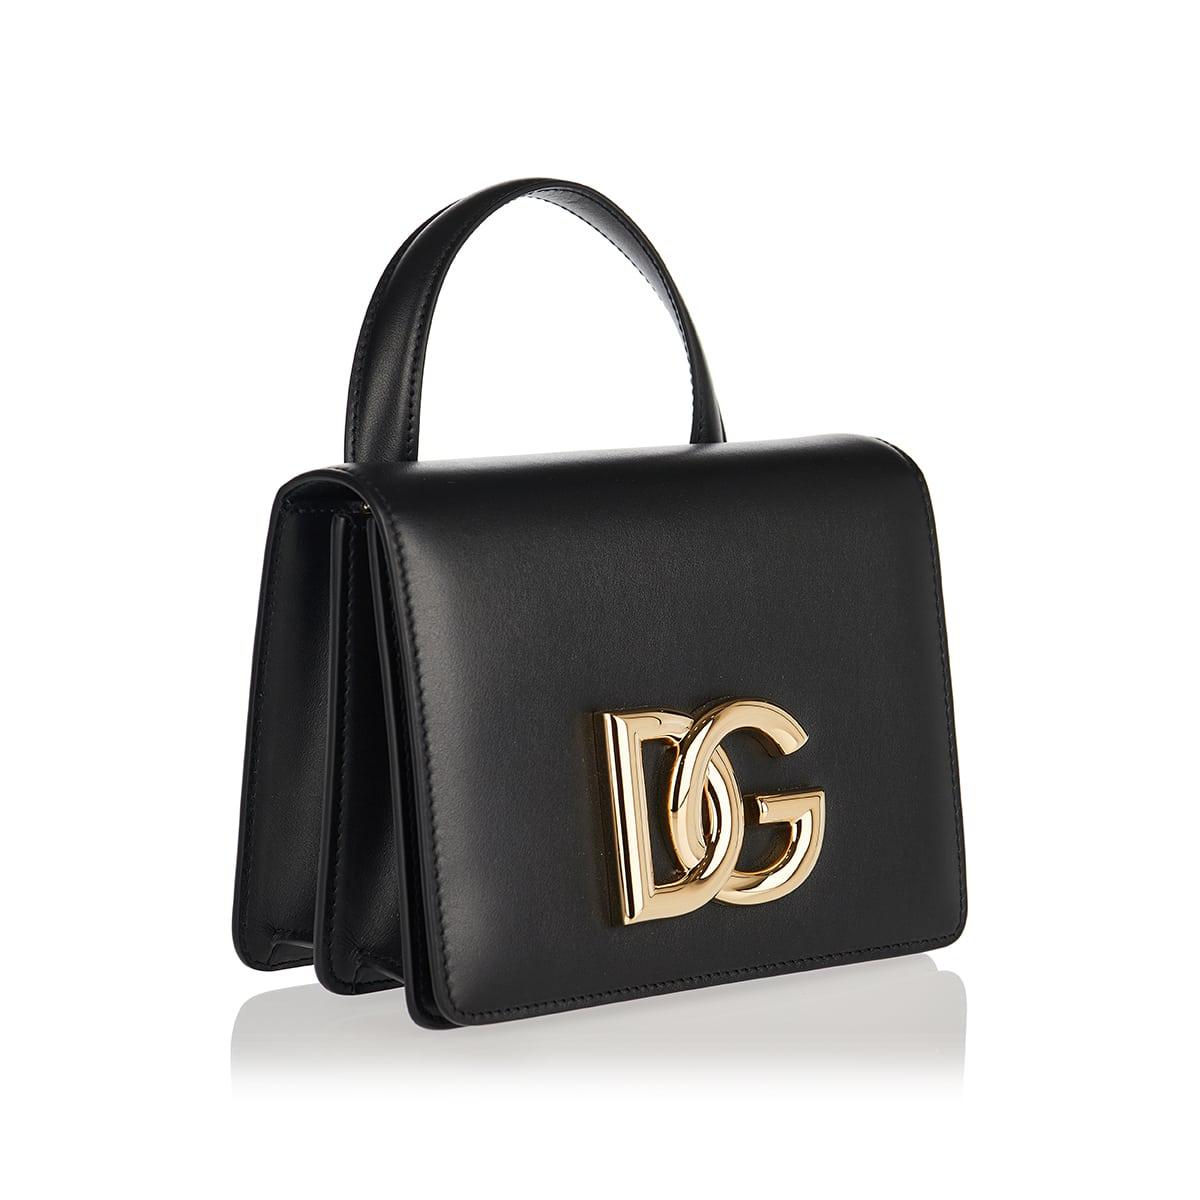 3.5 DG mini top-handle bag